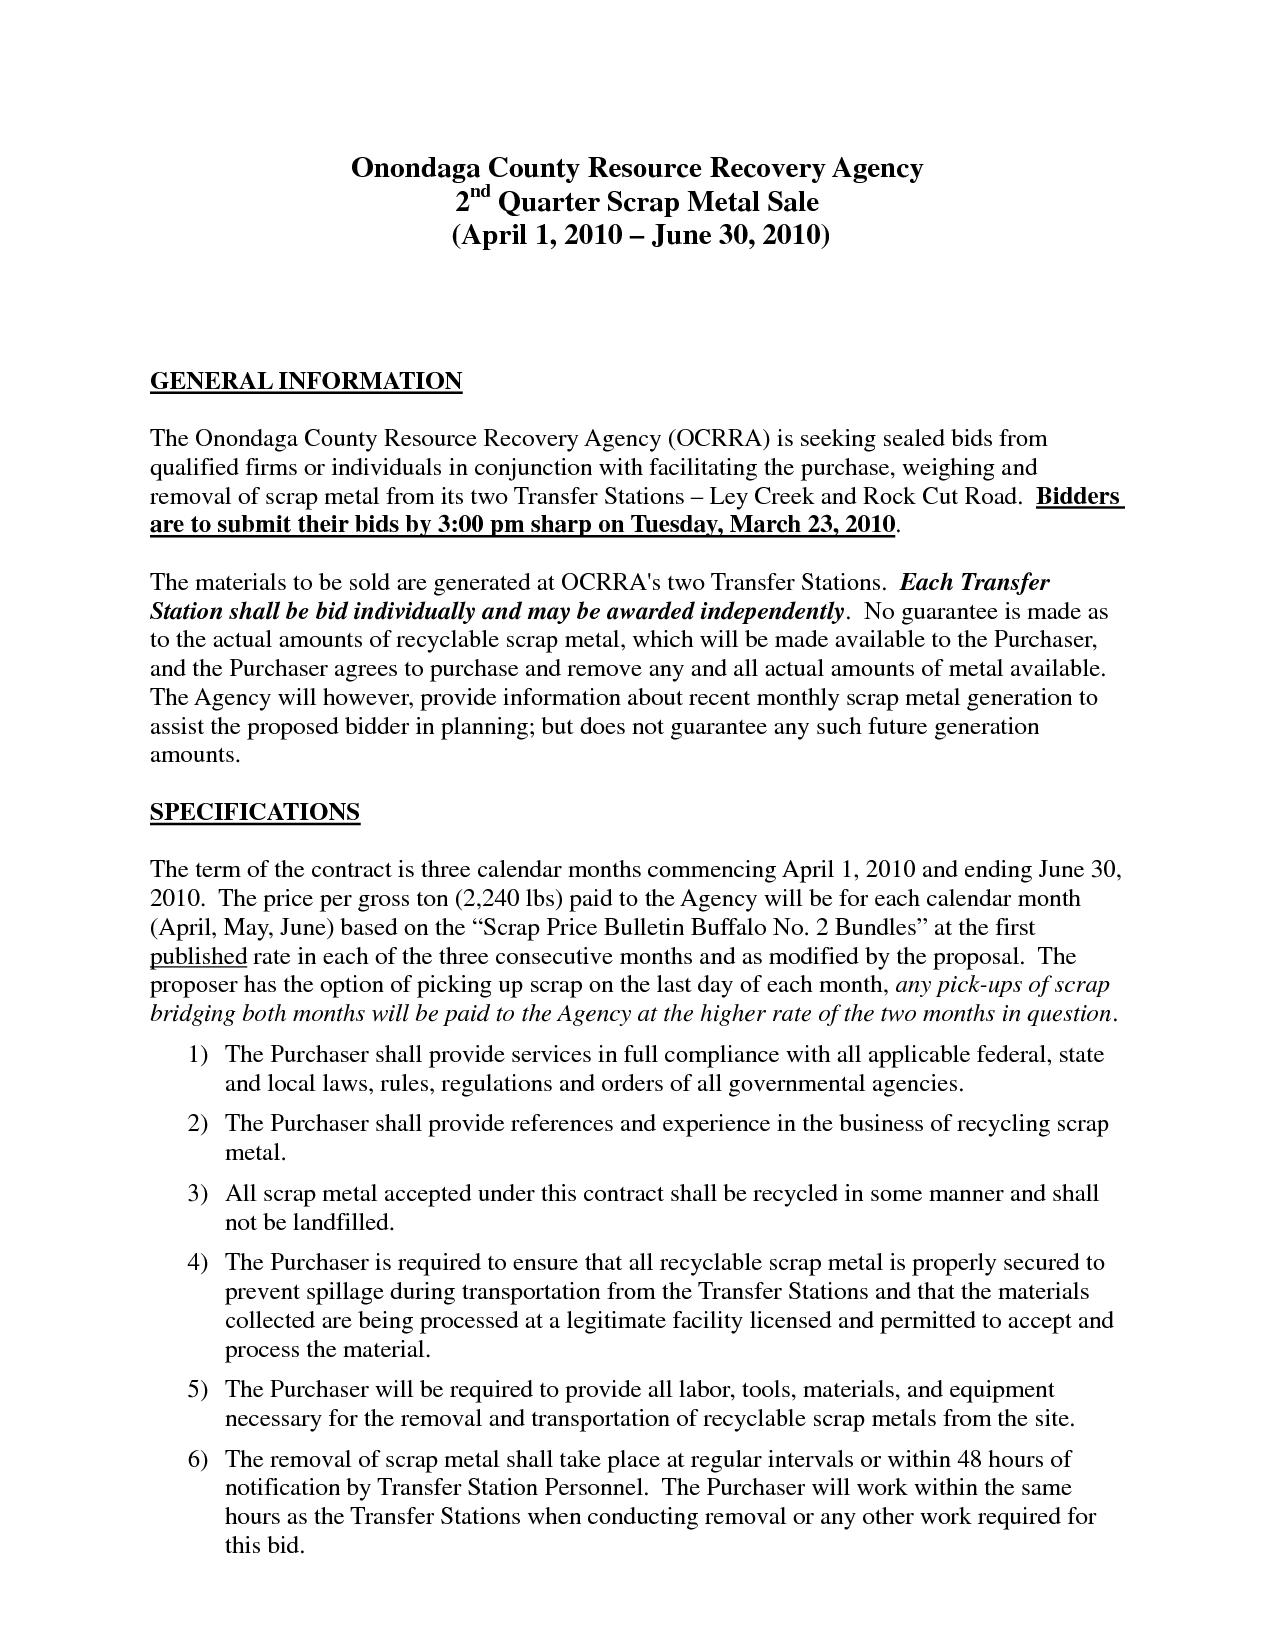 Printable Sample Business Proposal Template Form  Forms And In Sales Business Proposal Template